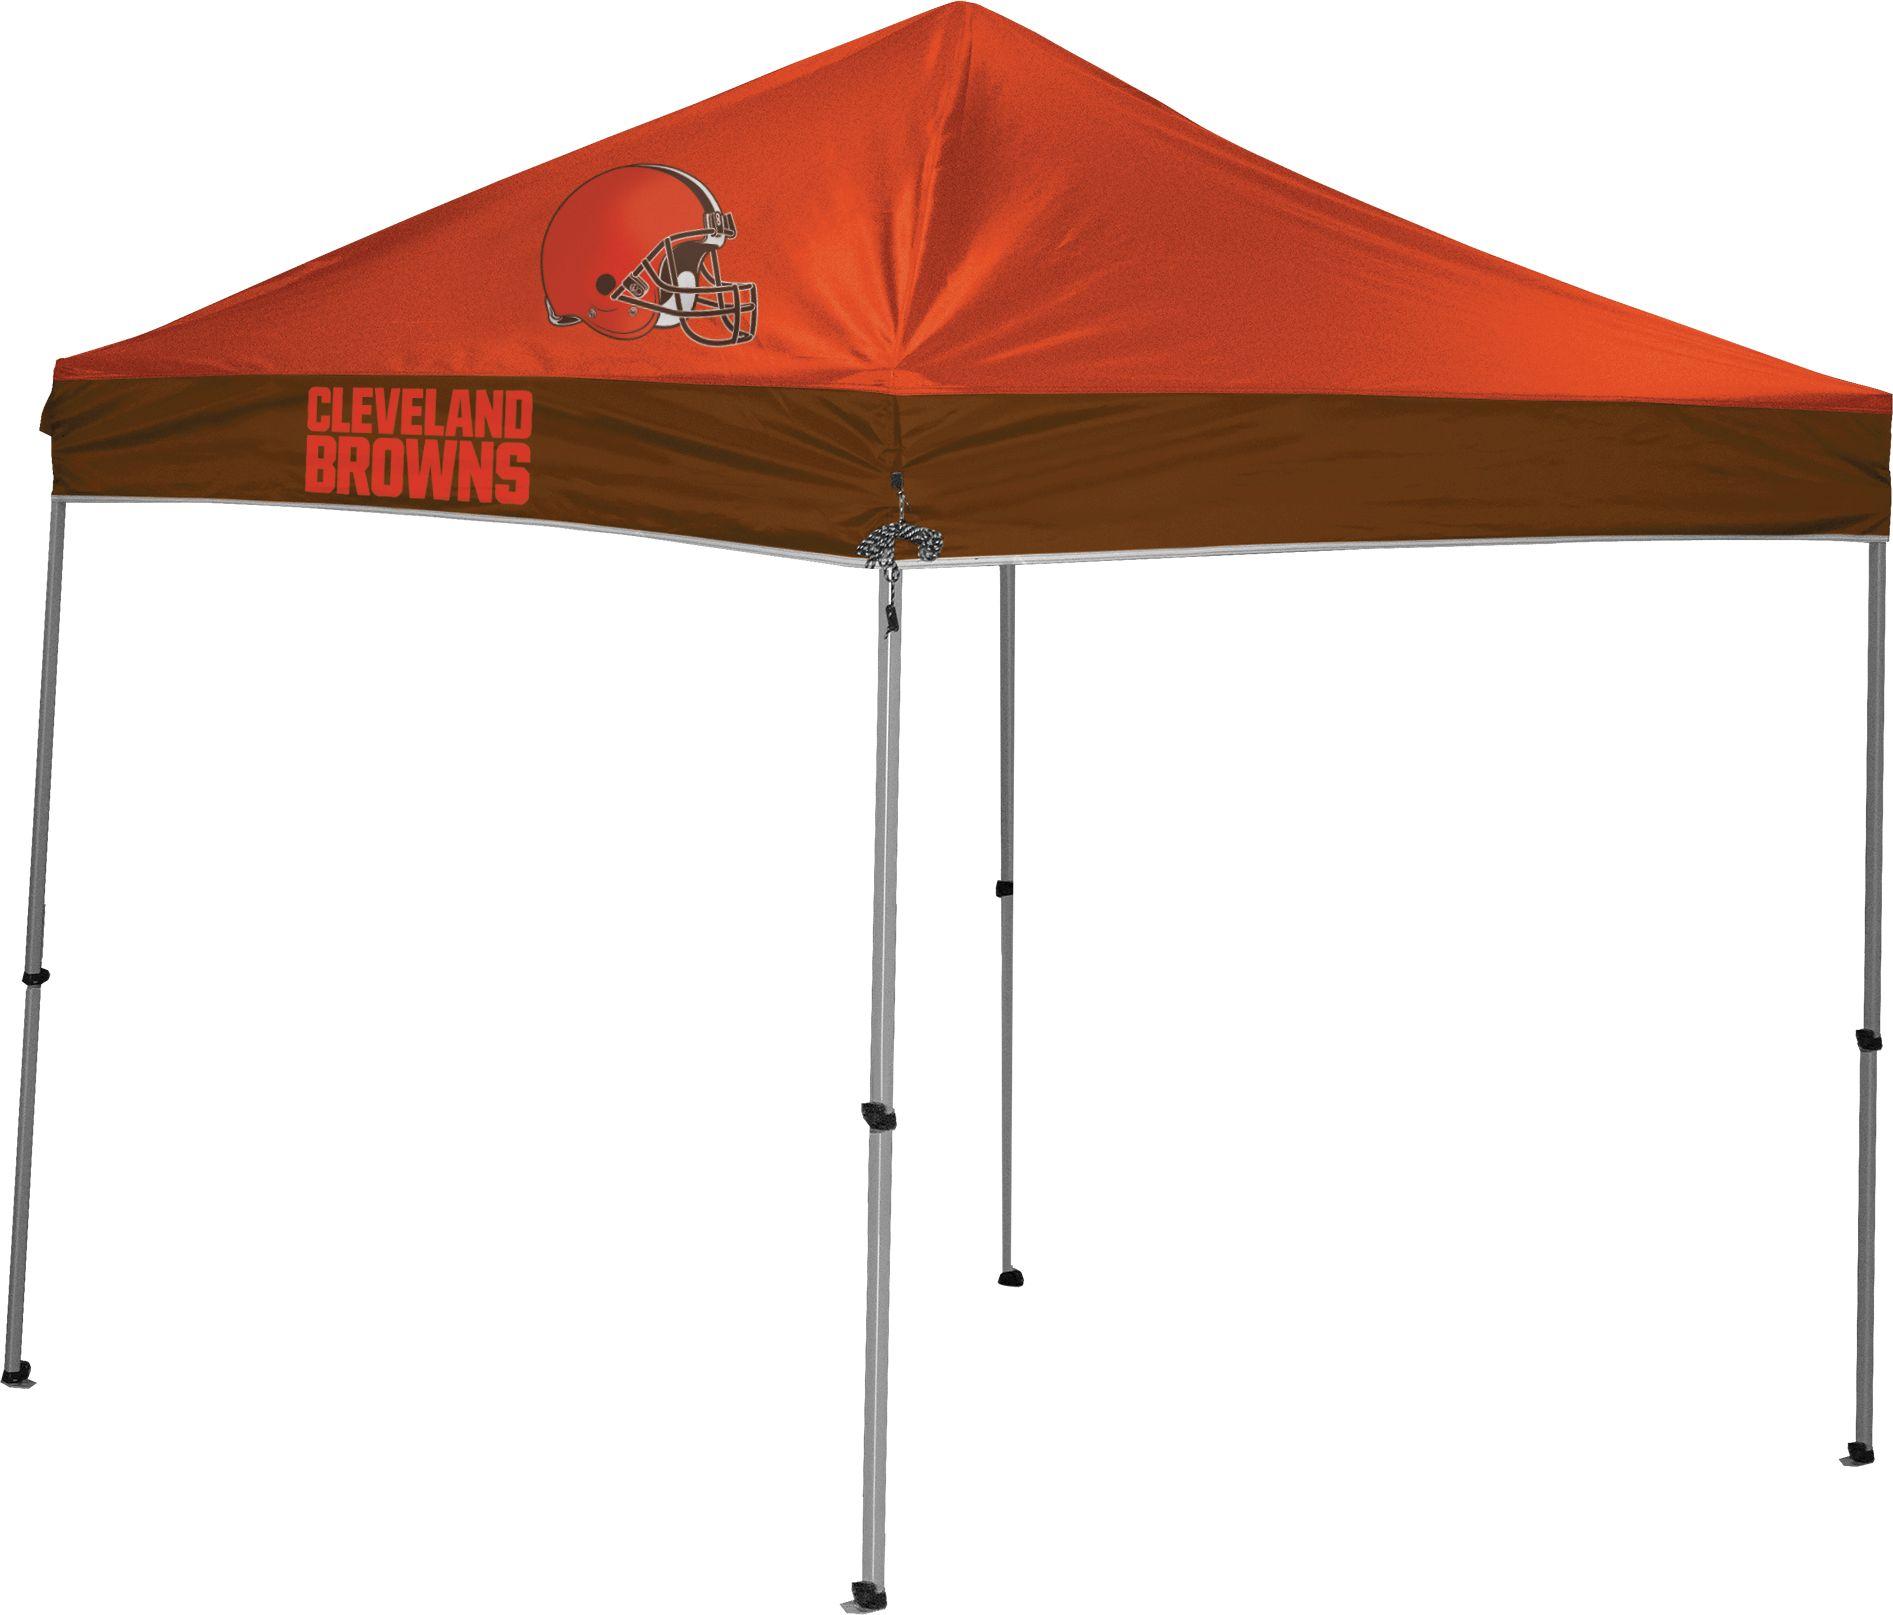 sc 1 st  DICKu0027S Sporting Goods & Rawlings Cleveland Browns 9u0027x9u0027 Canopy Tent | DICKu0027S Sporting Goods